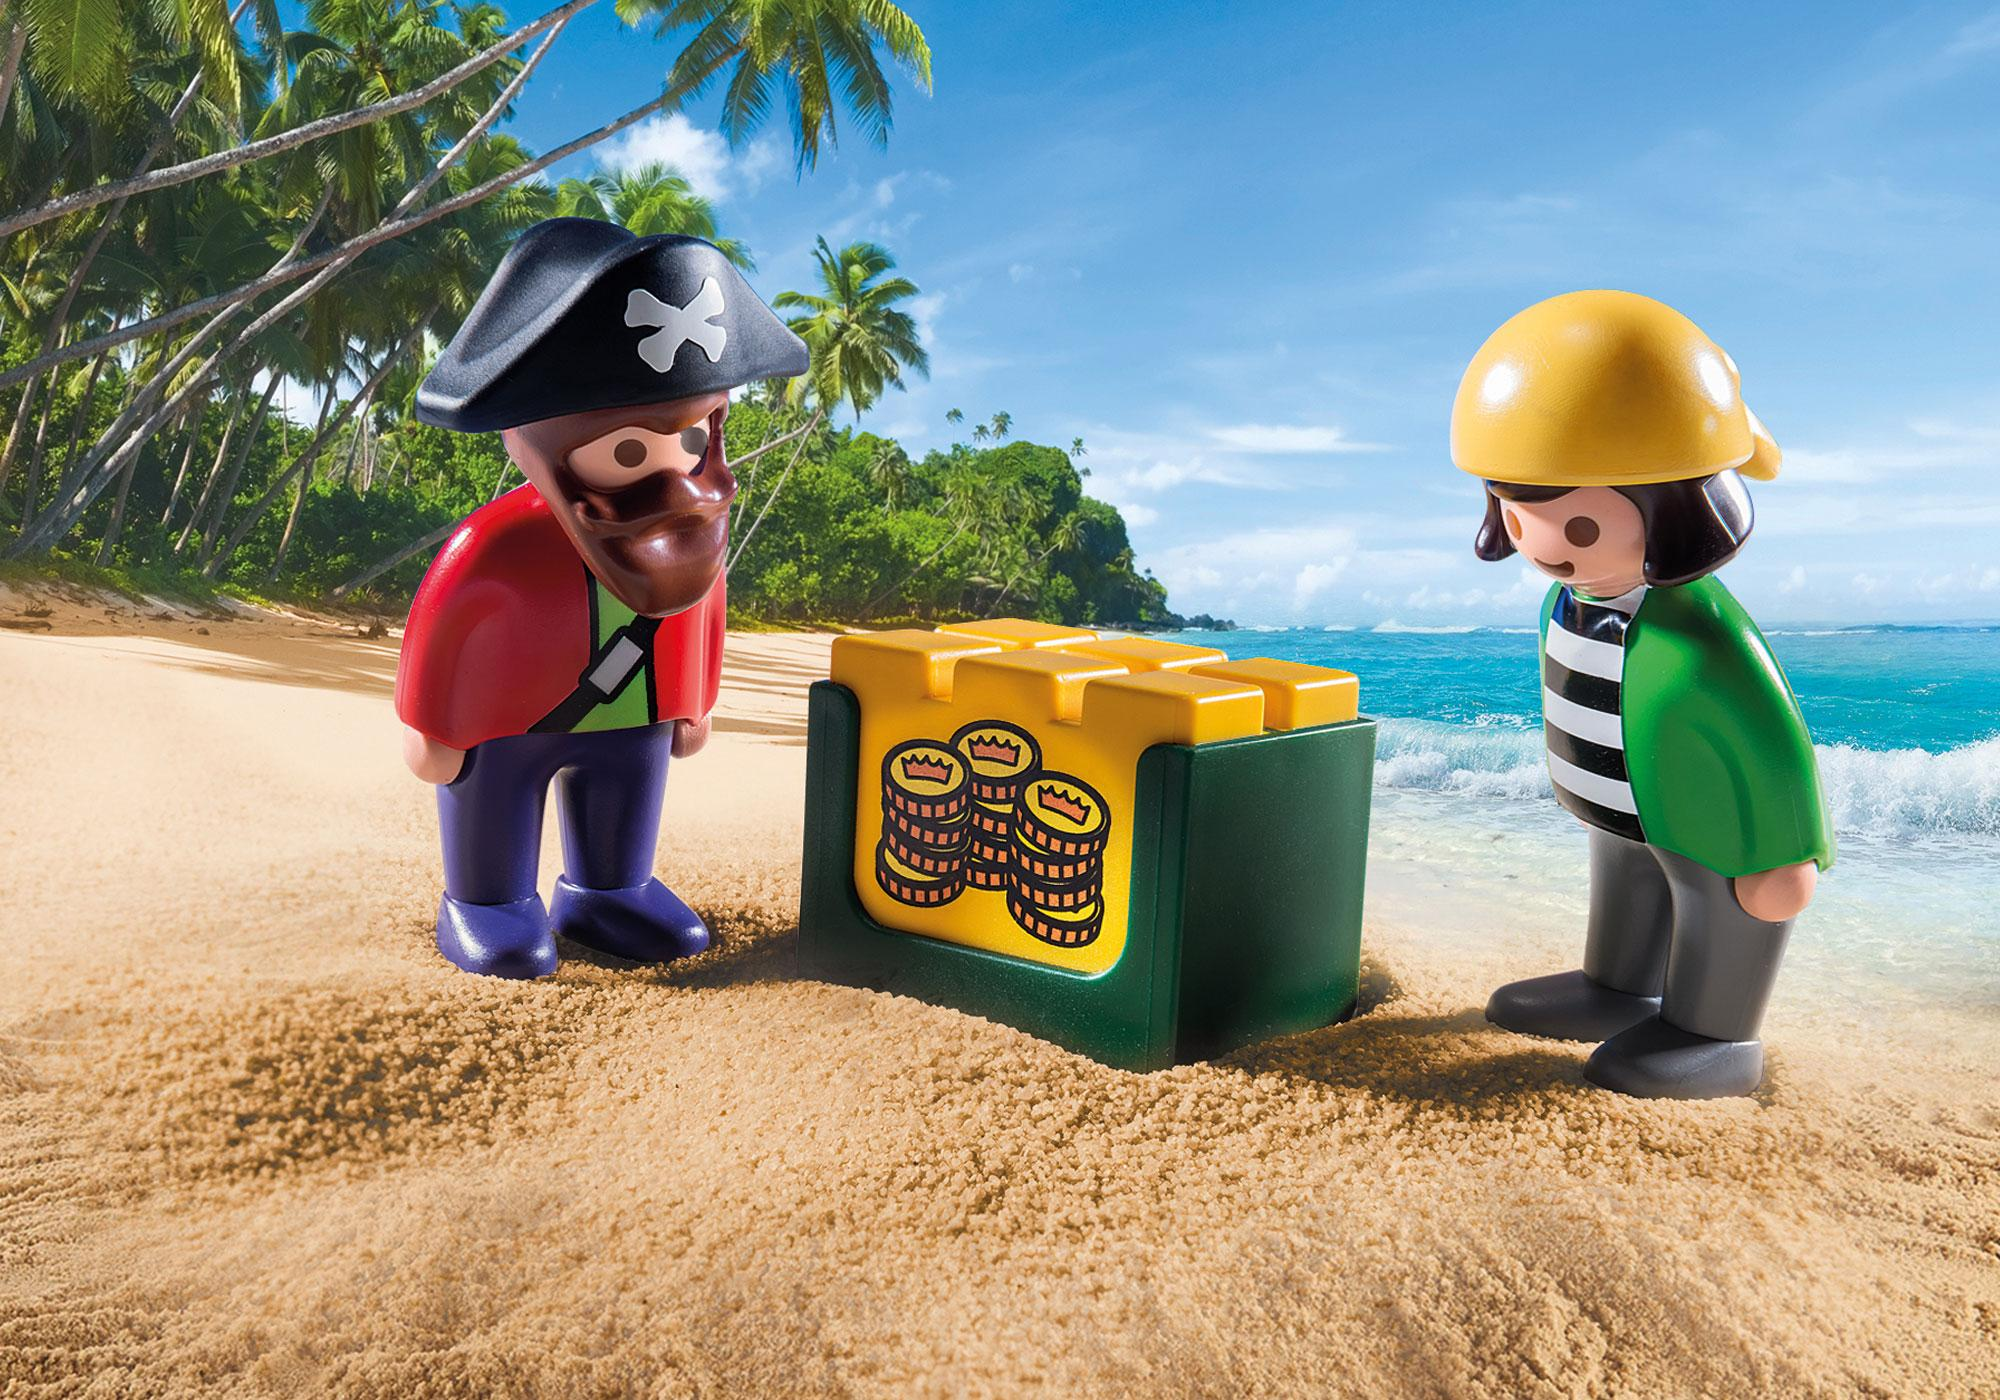 http://media.playmobil.com/i/playmobil/9118_product_extra1/1.2.3 Piratenschip